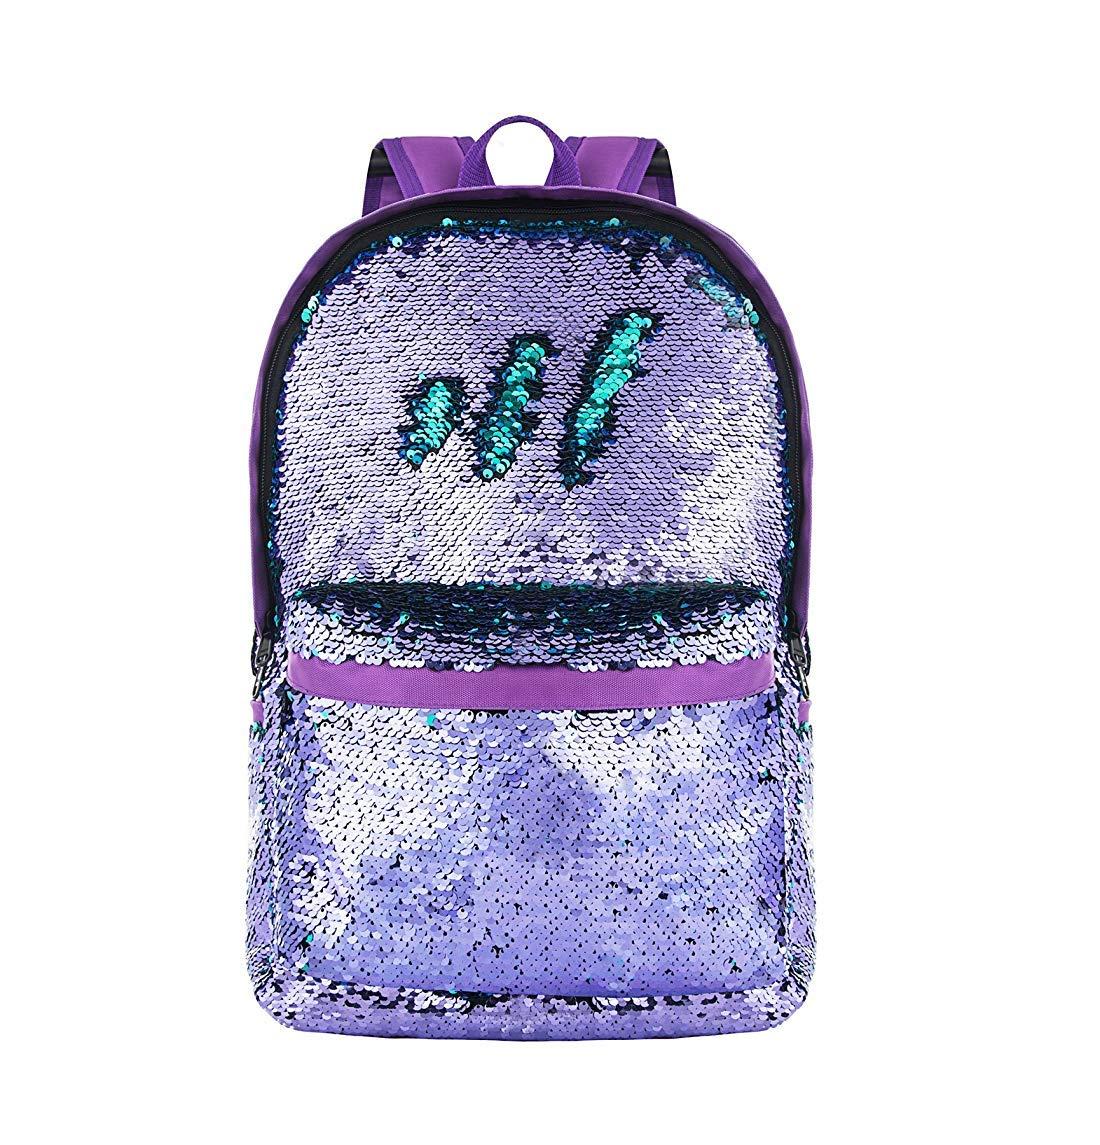 Amazon.com | MQiong Reversible Sequins School Backpack Bag for Girls Boys Fashion Lightweight Travel Backpacks Rainbow/Silver | Kids Backpacks